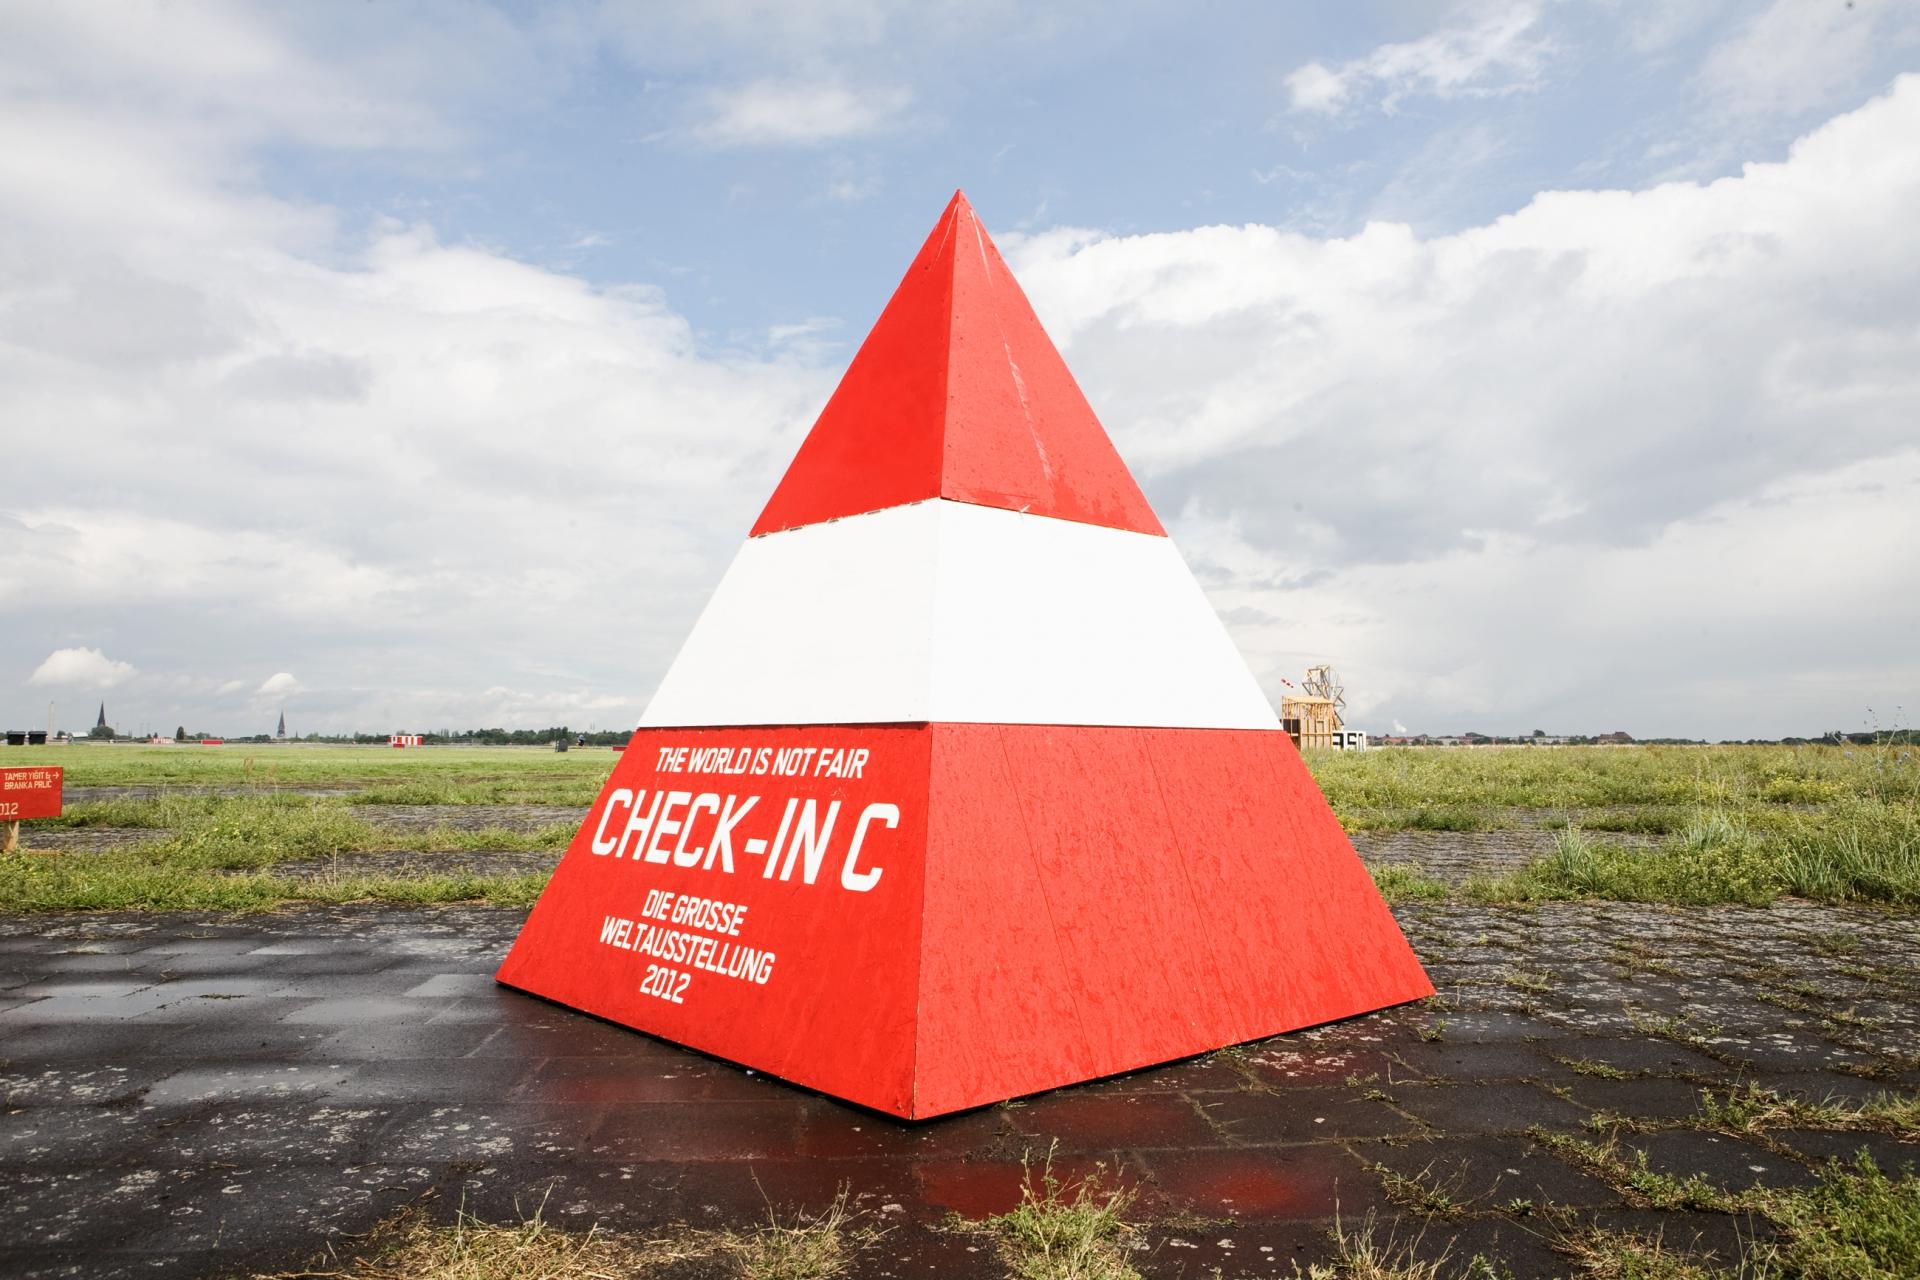 Re-Make/Re-Model Pyramid Scheme